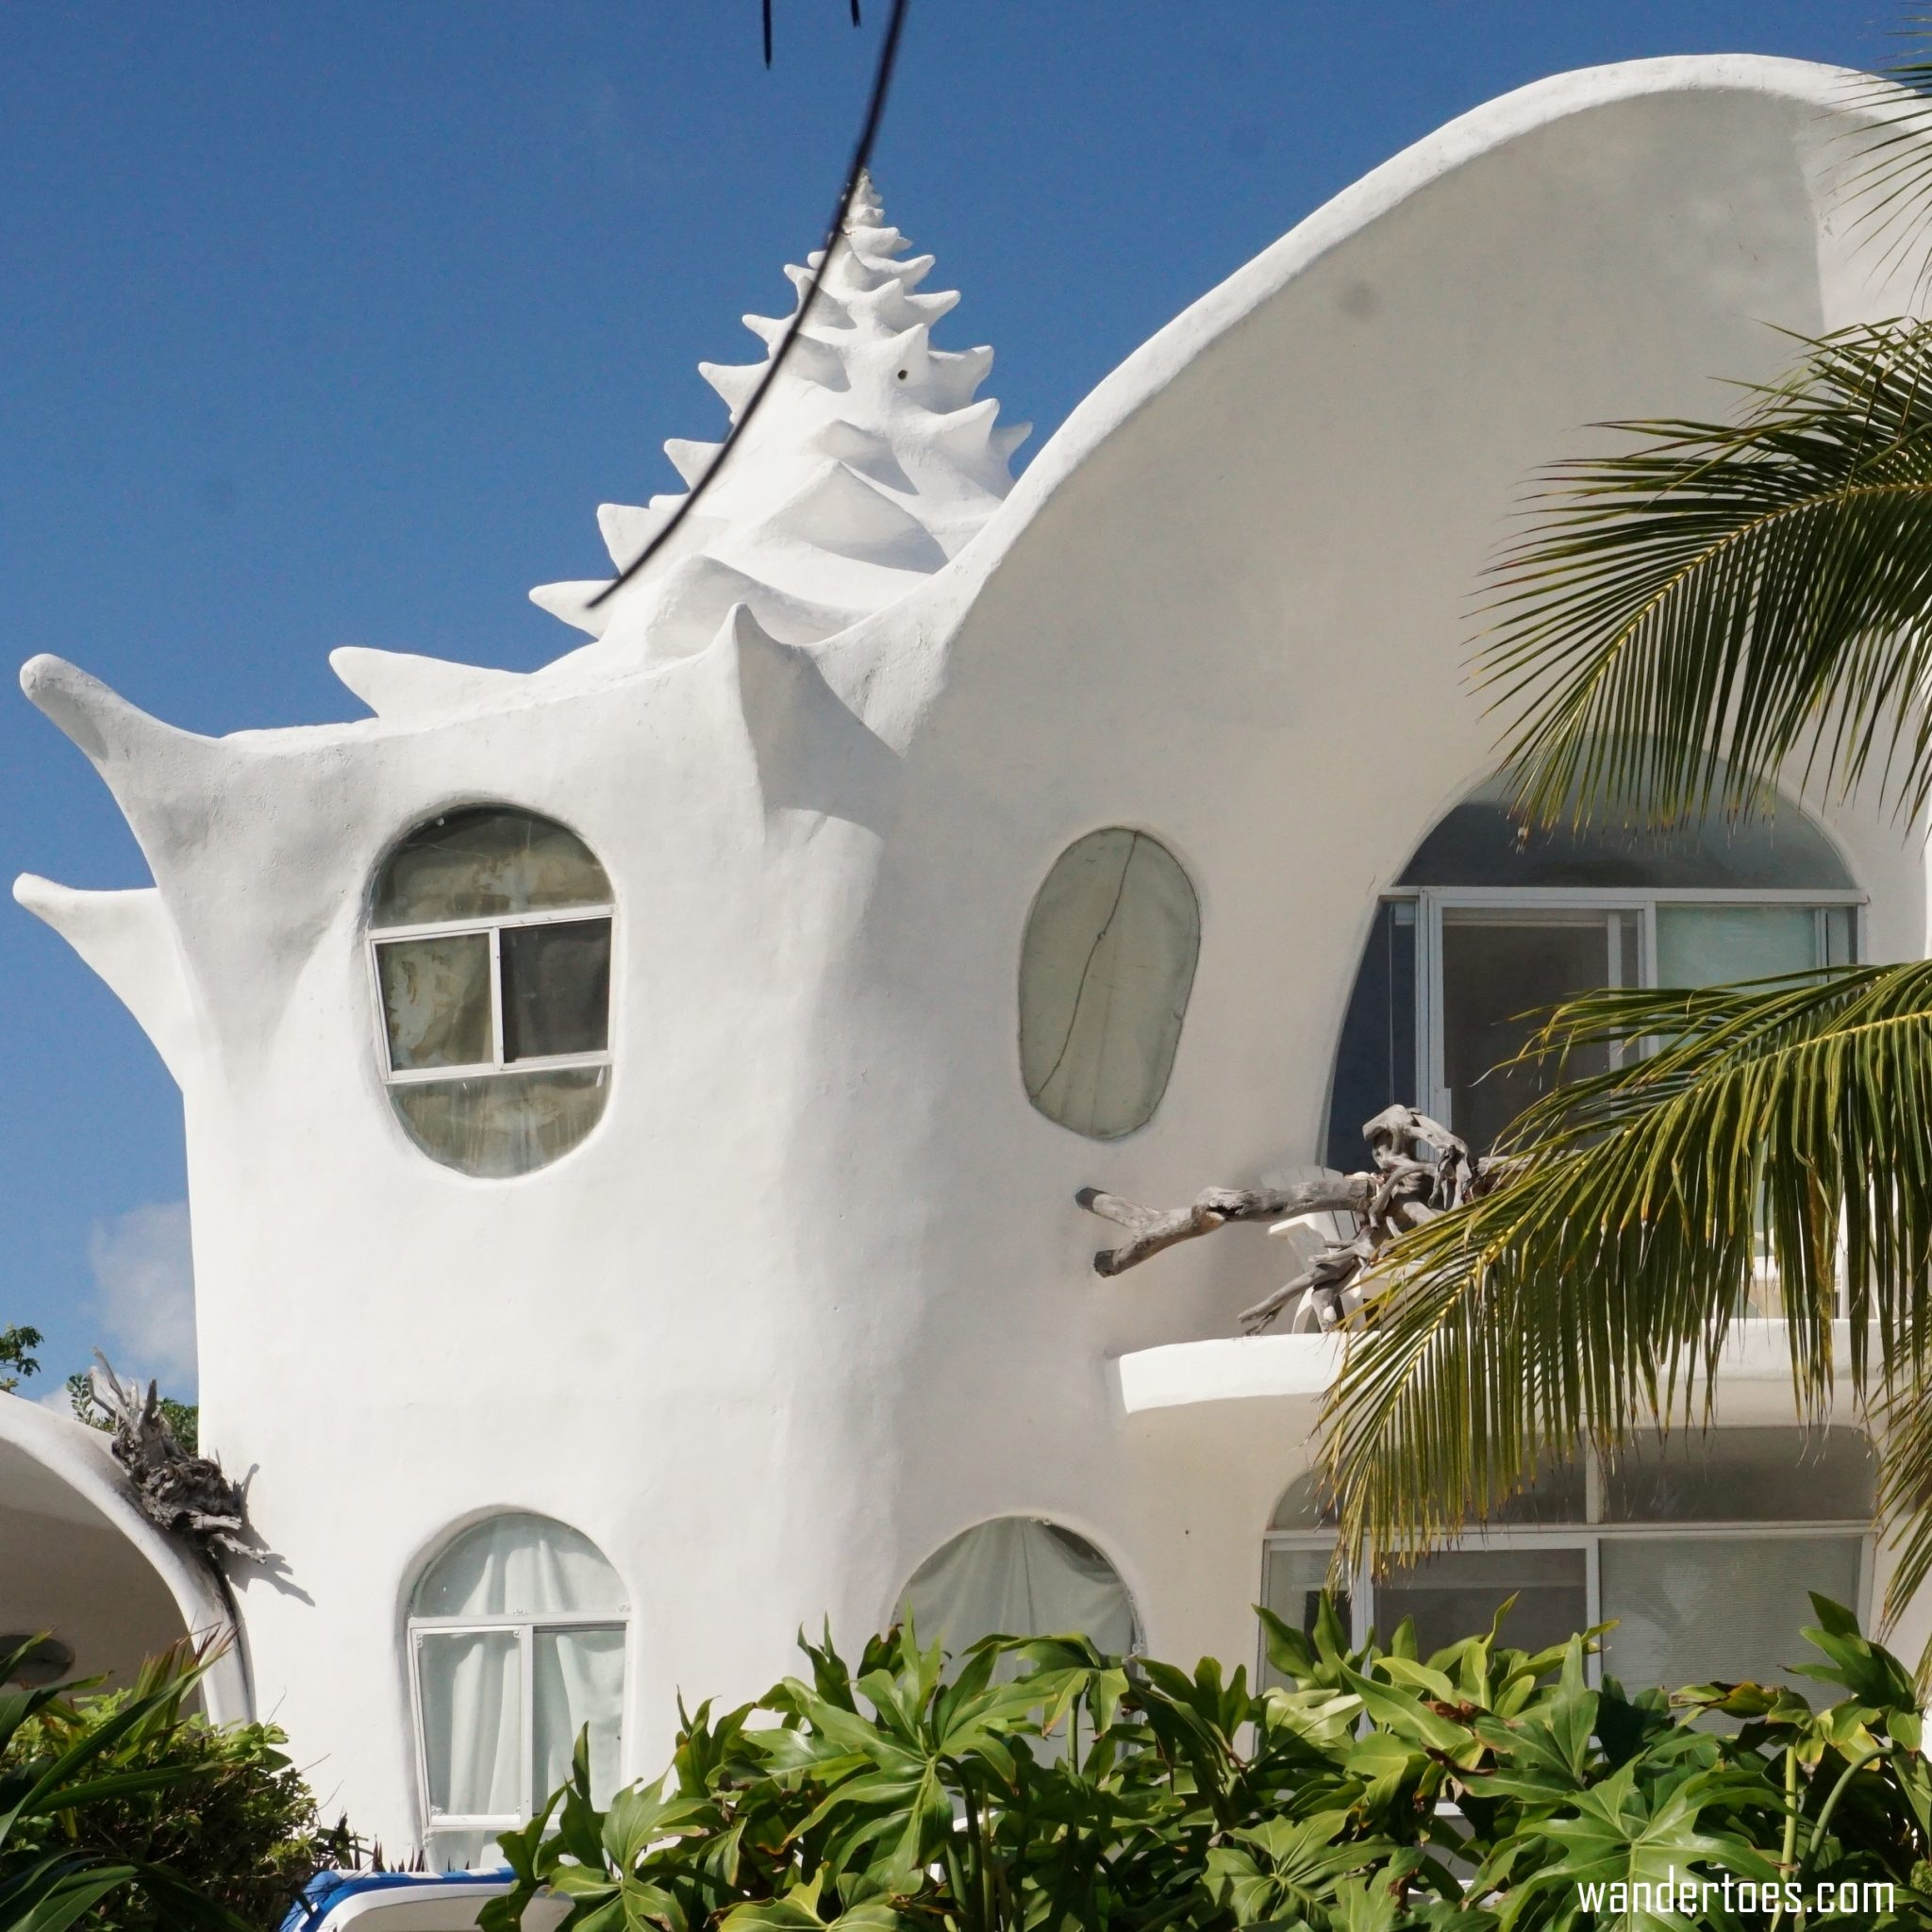 Top 10 Isla Mujeres Things To Do - Wandertoes